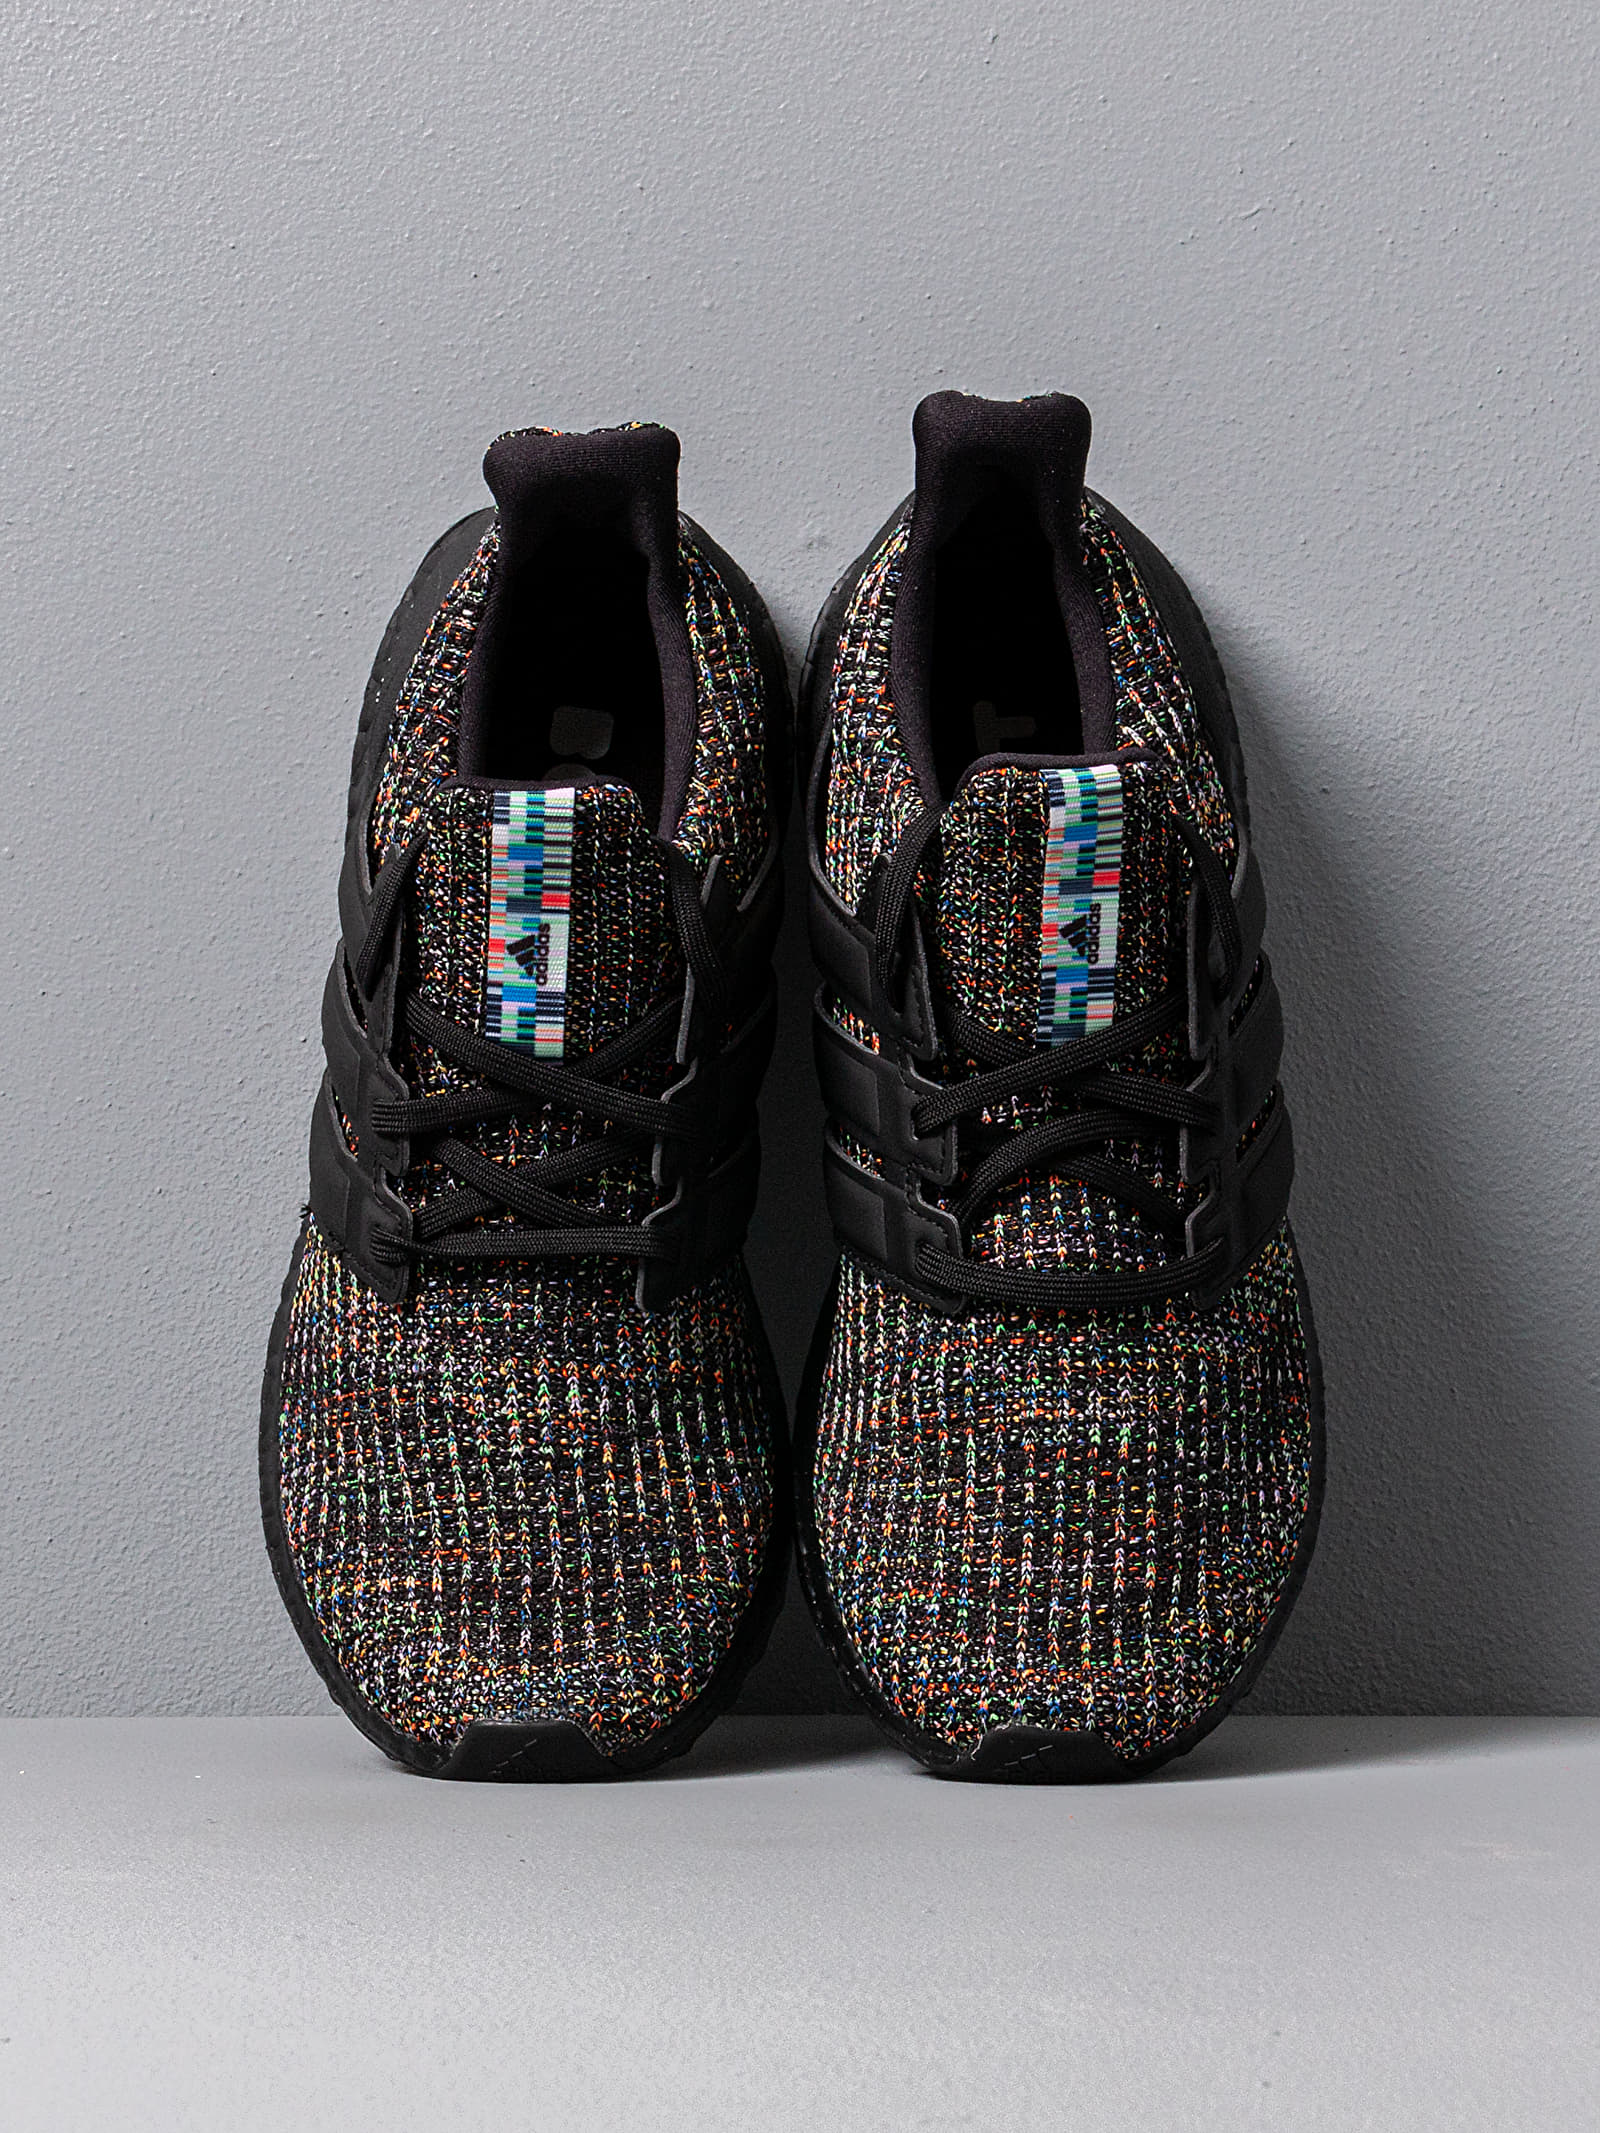 Men's shoes adidas UltraBOOST m Core